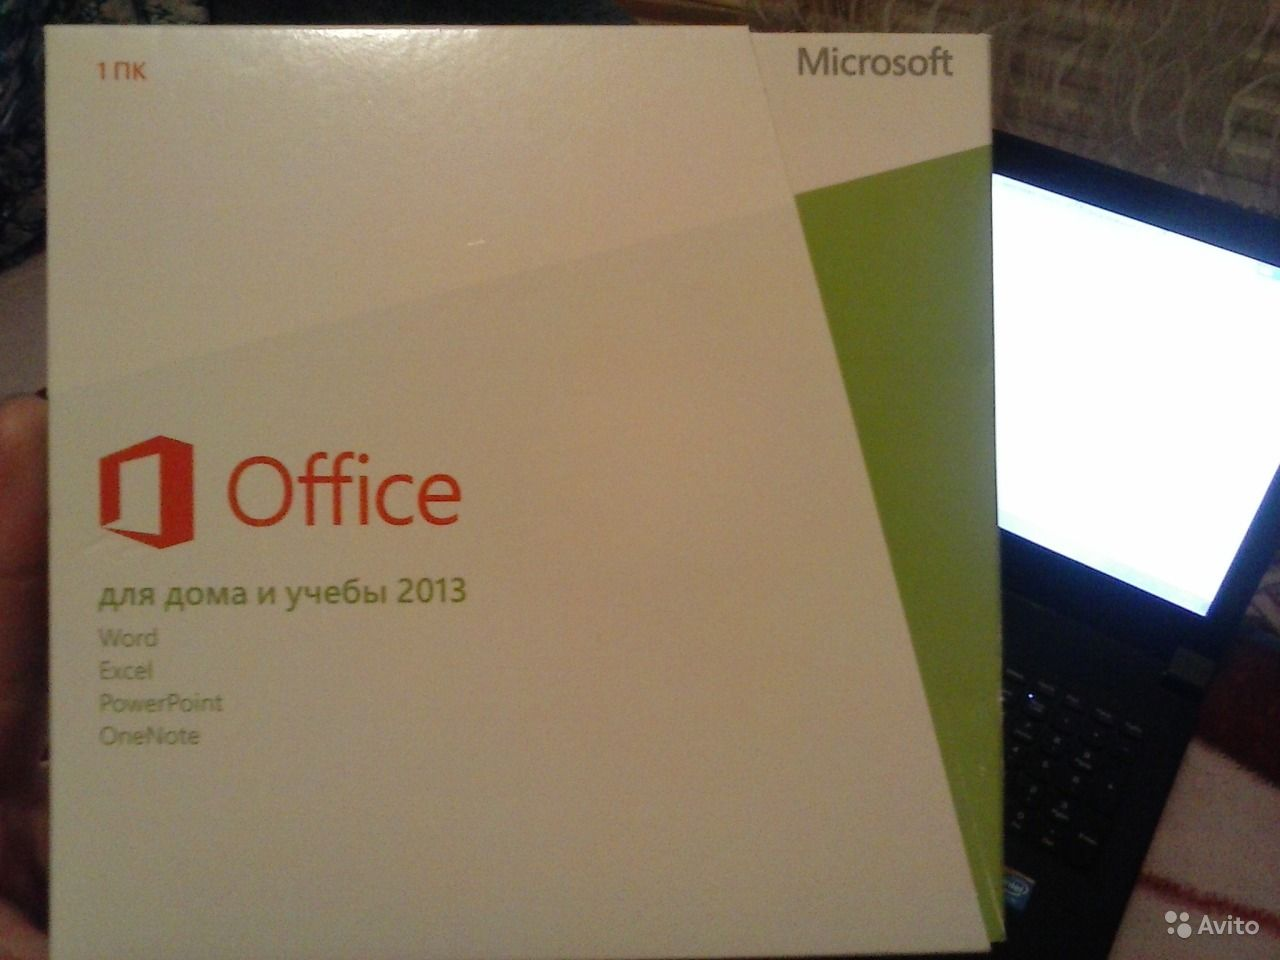 MS Office 2013 Volume License Activation  Windows OS Hub